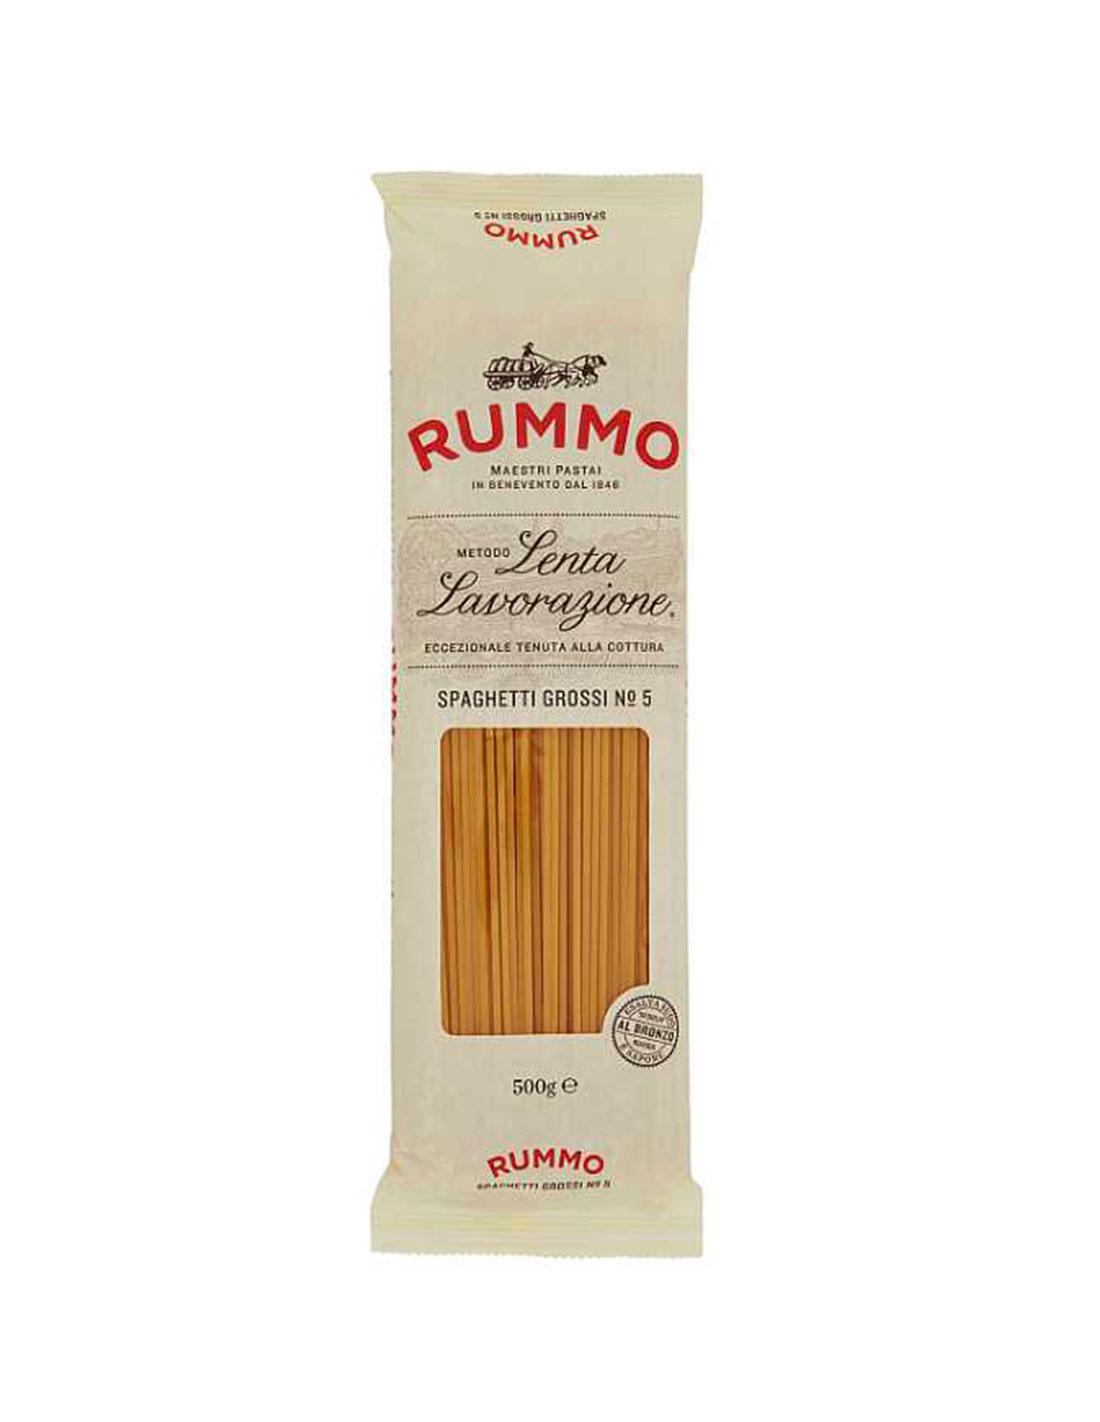 rummo-spaghetti-grossi-n5-500-g